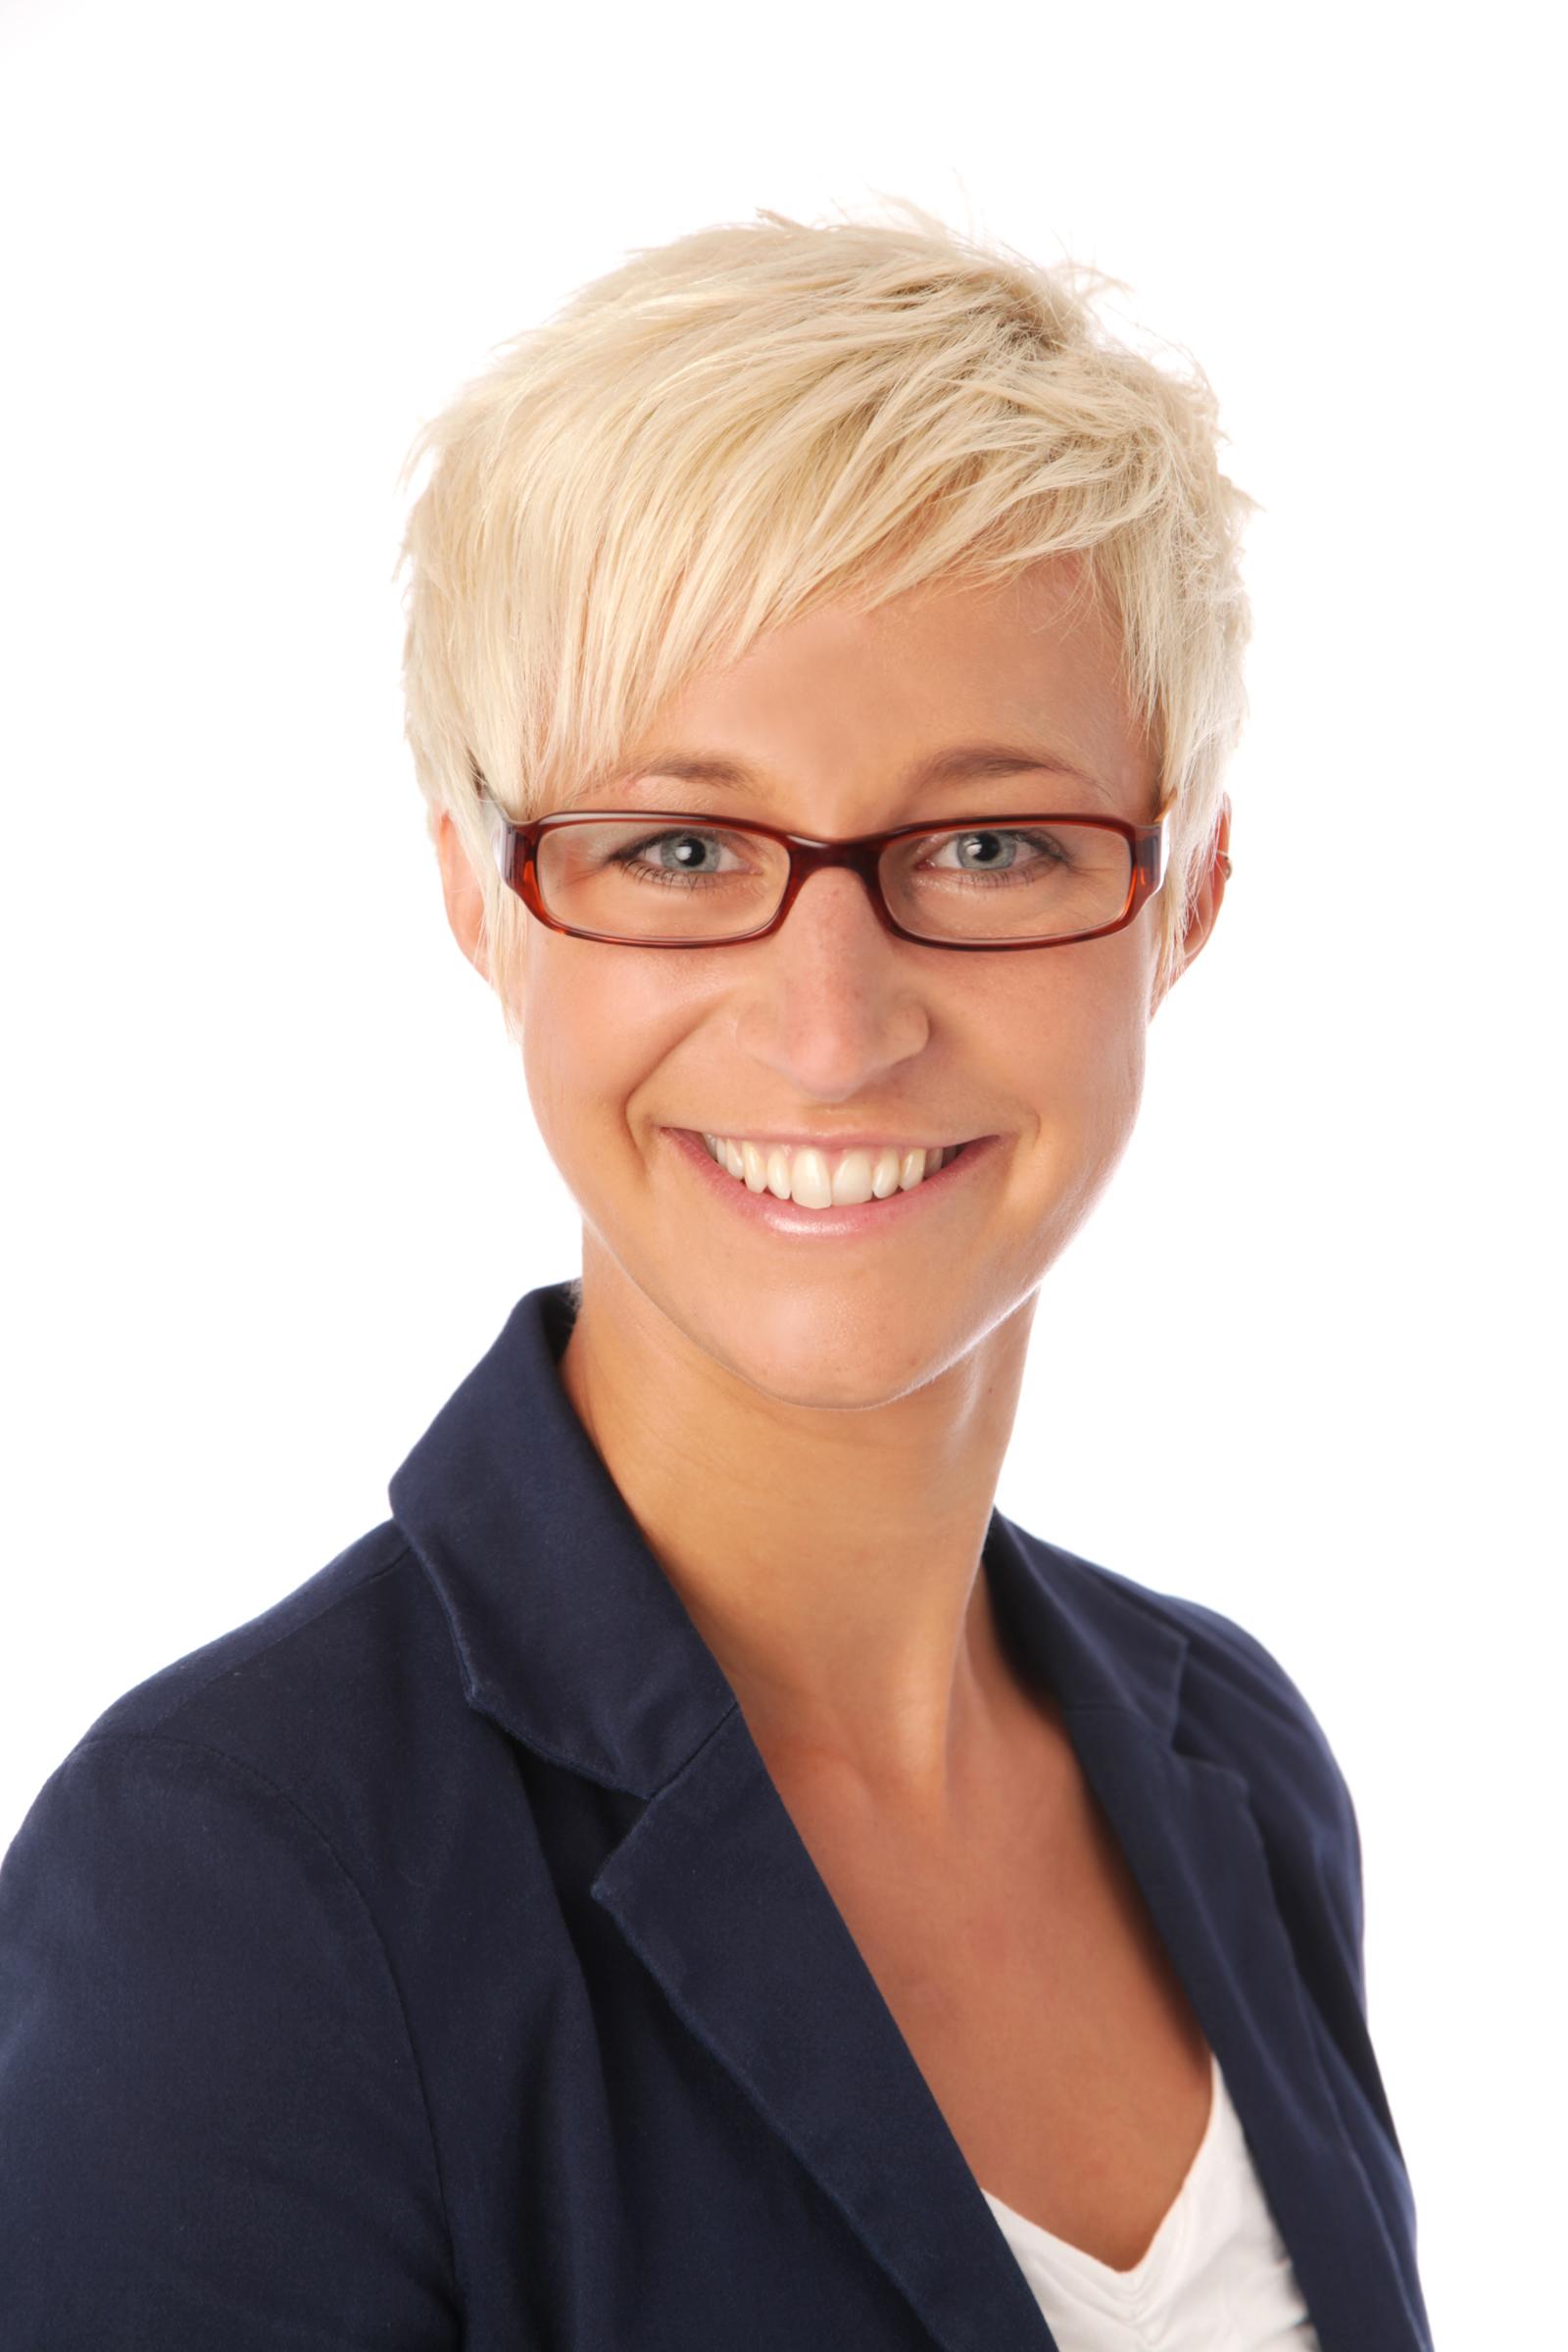 Description Nadine Müller - Nadine Schön - CDU-Bundestagsabgeordete ...